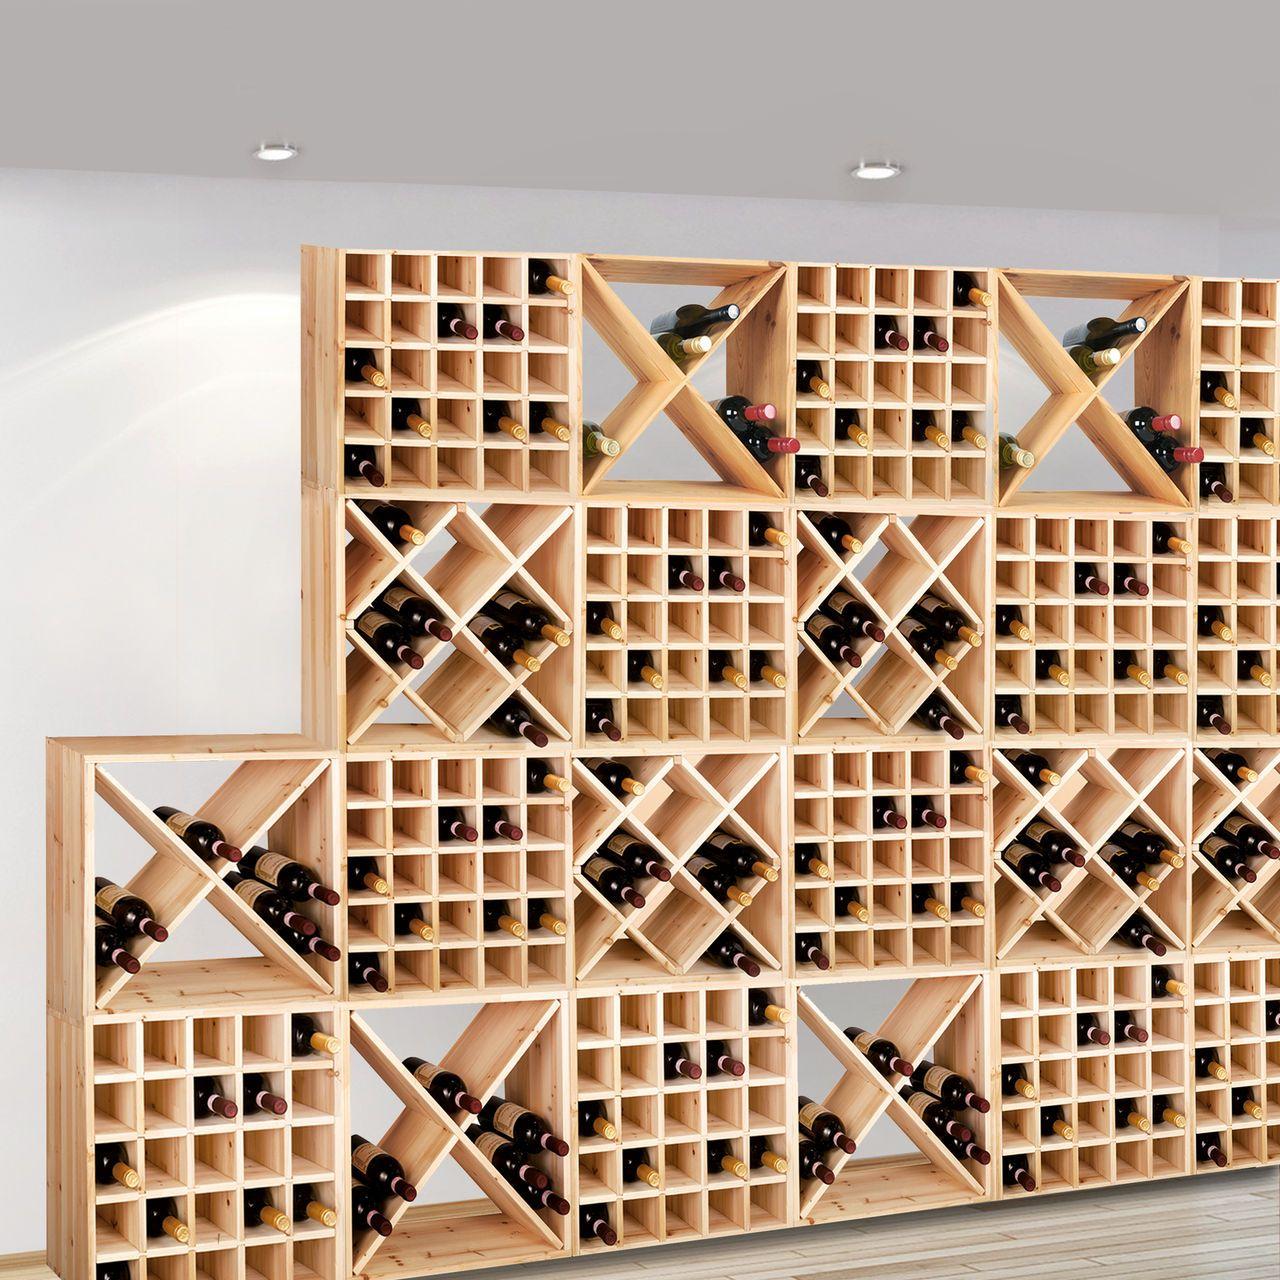 weinregal system cube 52 natur weinregale weinregal. Black Bedroom Furniture Sets. Home Design Ideas